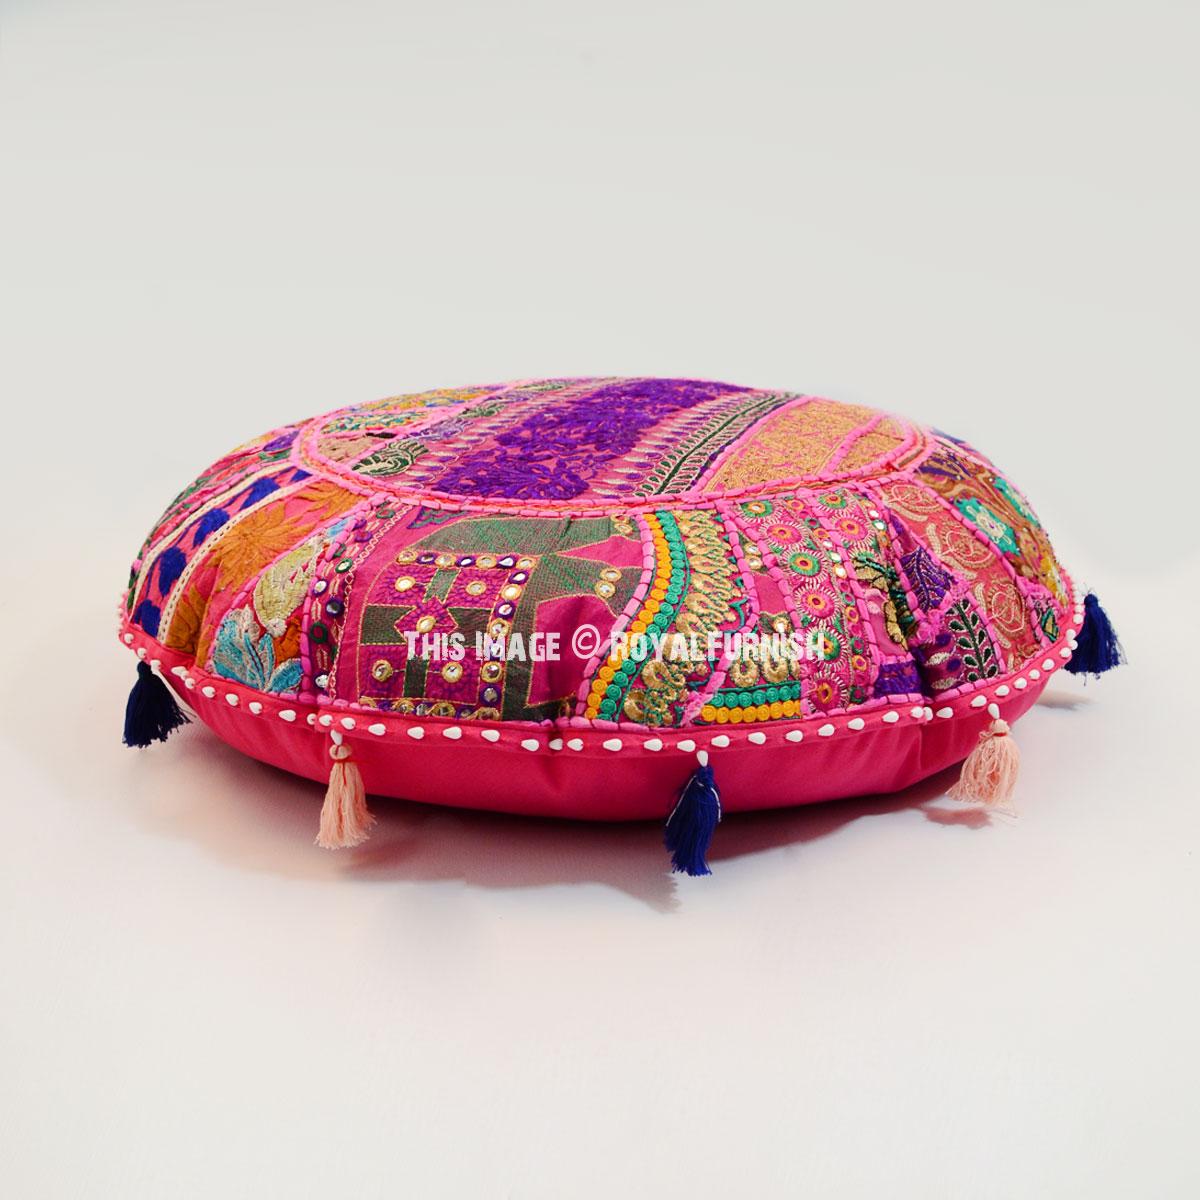 Pleasant Gorgeous Pink 28 Inch Patchwork Round Yoga Floor Cushion Cover Lamtechconsult Wood Chair Design Ideas Lamtechconsultcom